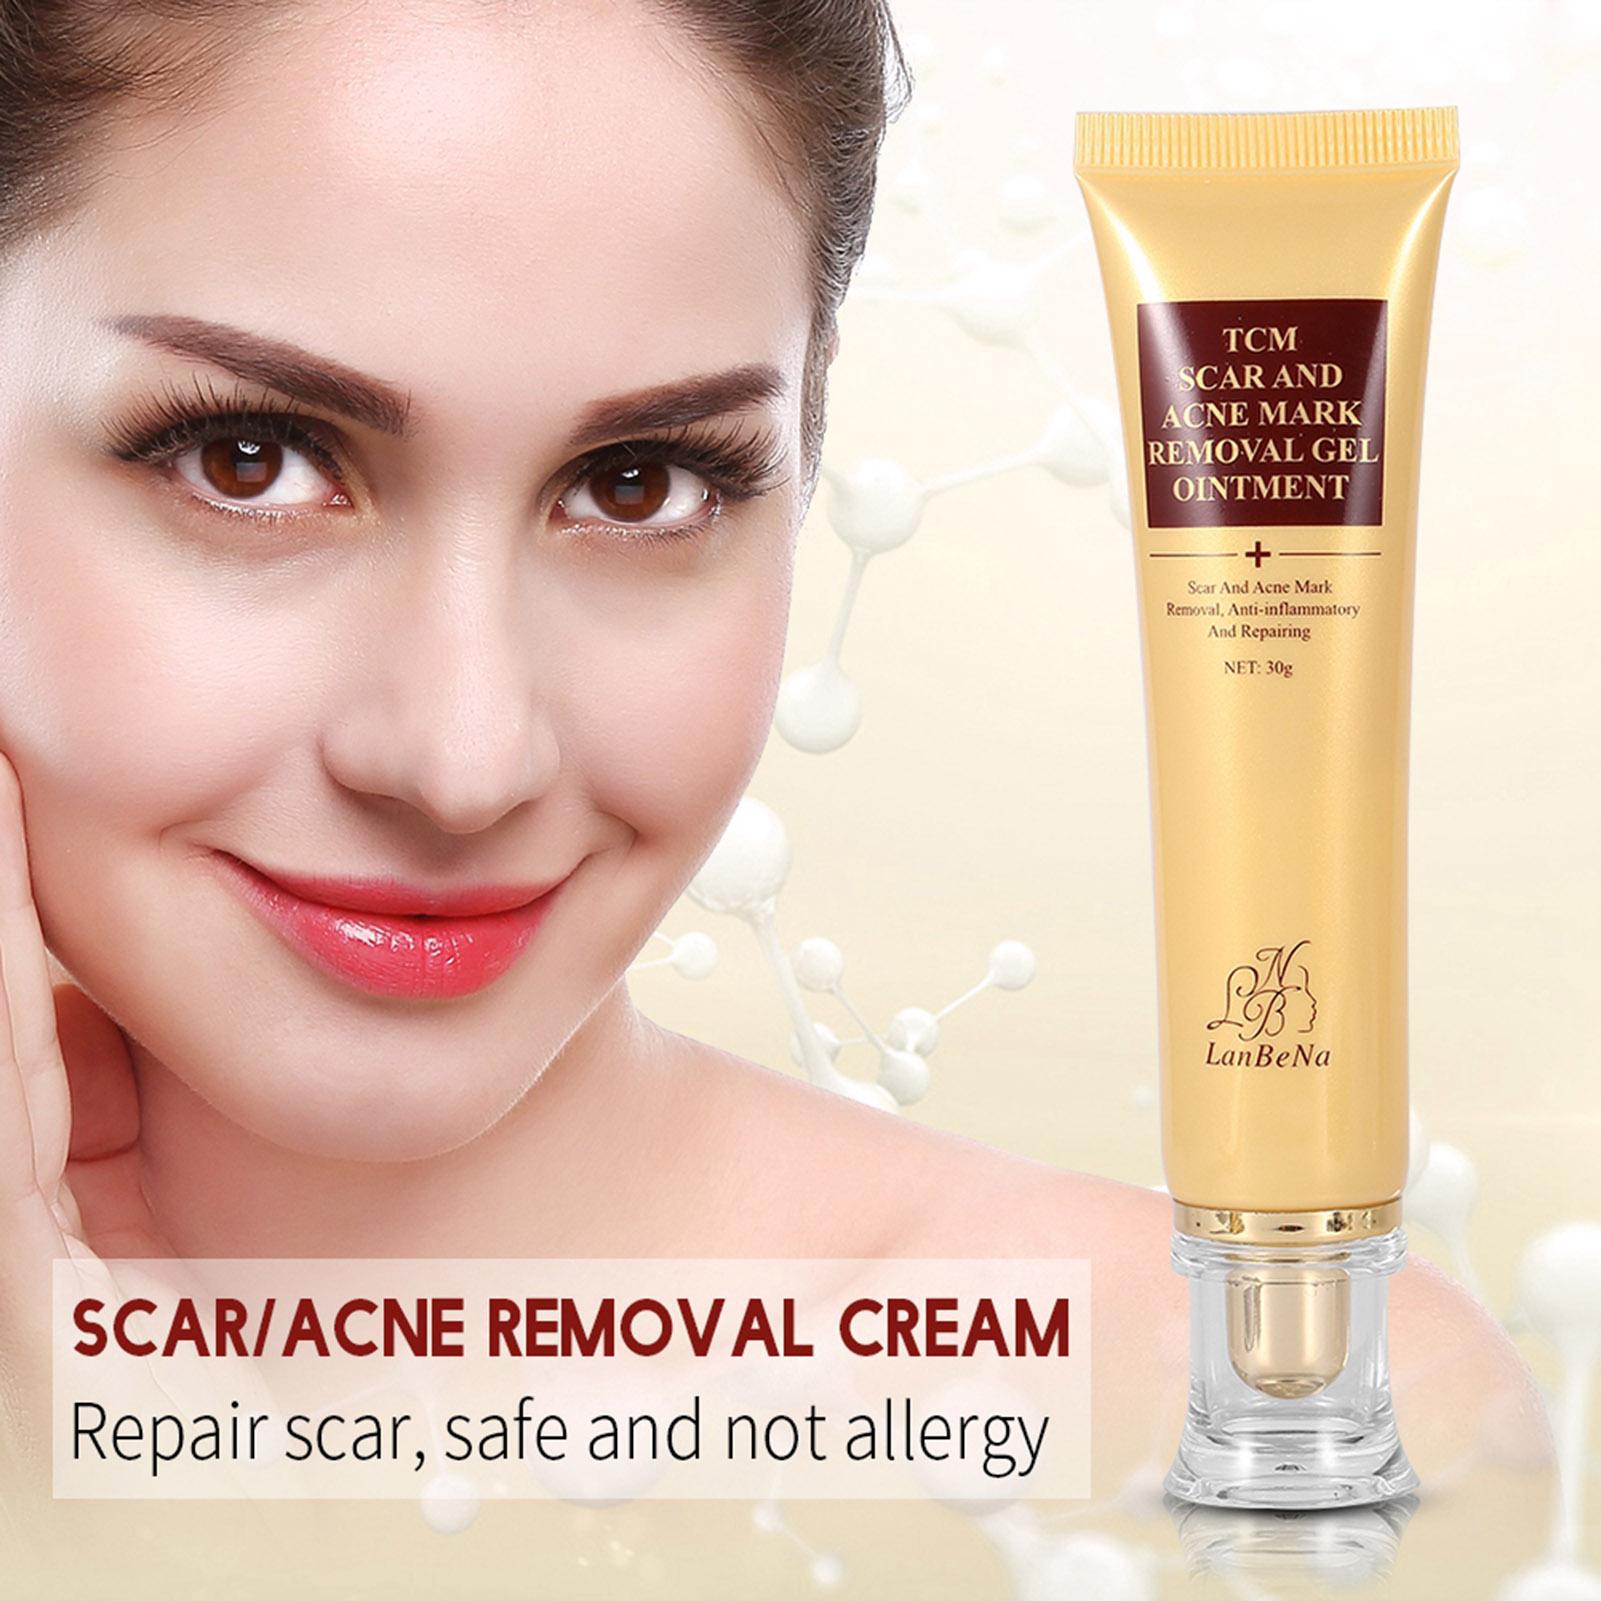 lanbena acne scar removal cream skin repair face cream acne spots treatment 30g ebay. Black Bedroom Furniture Sets. Home Design Ideas